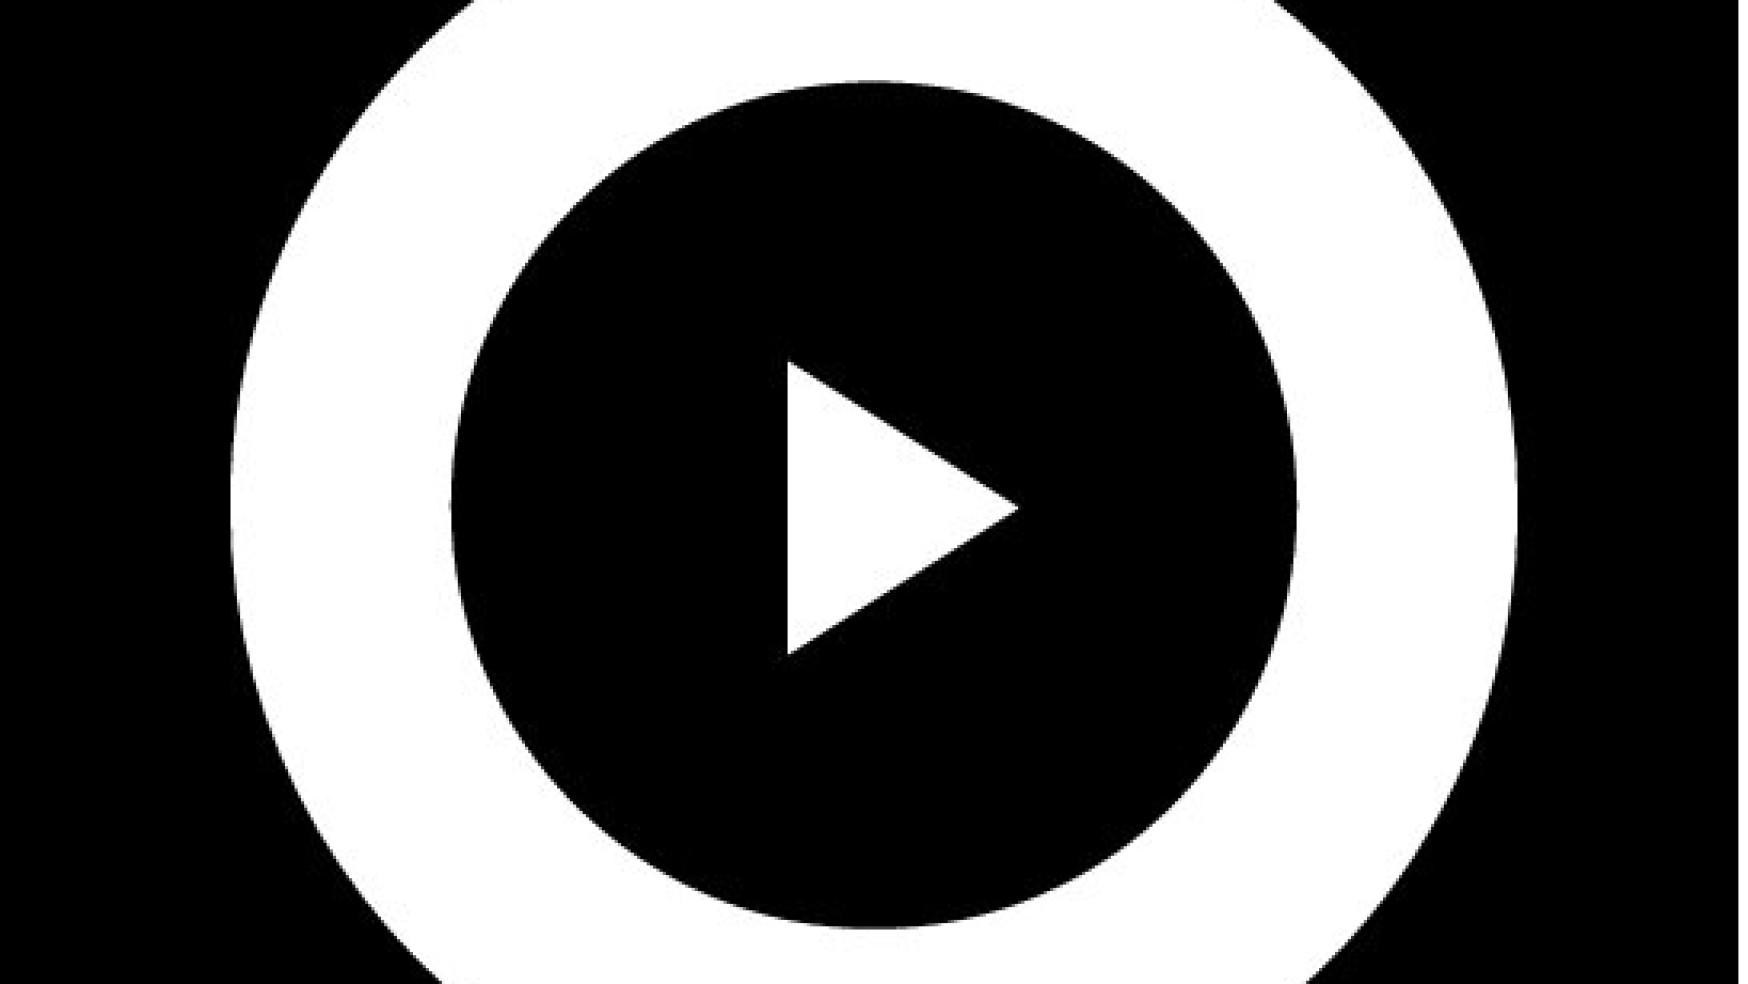 Tsunami Wazahari - Click Clack EP